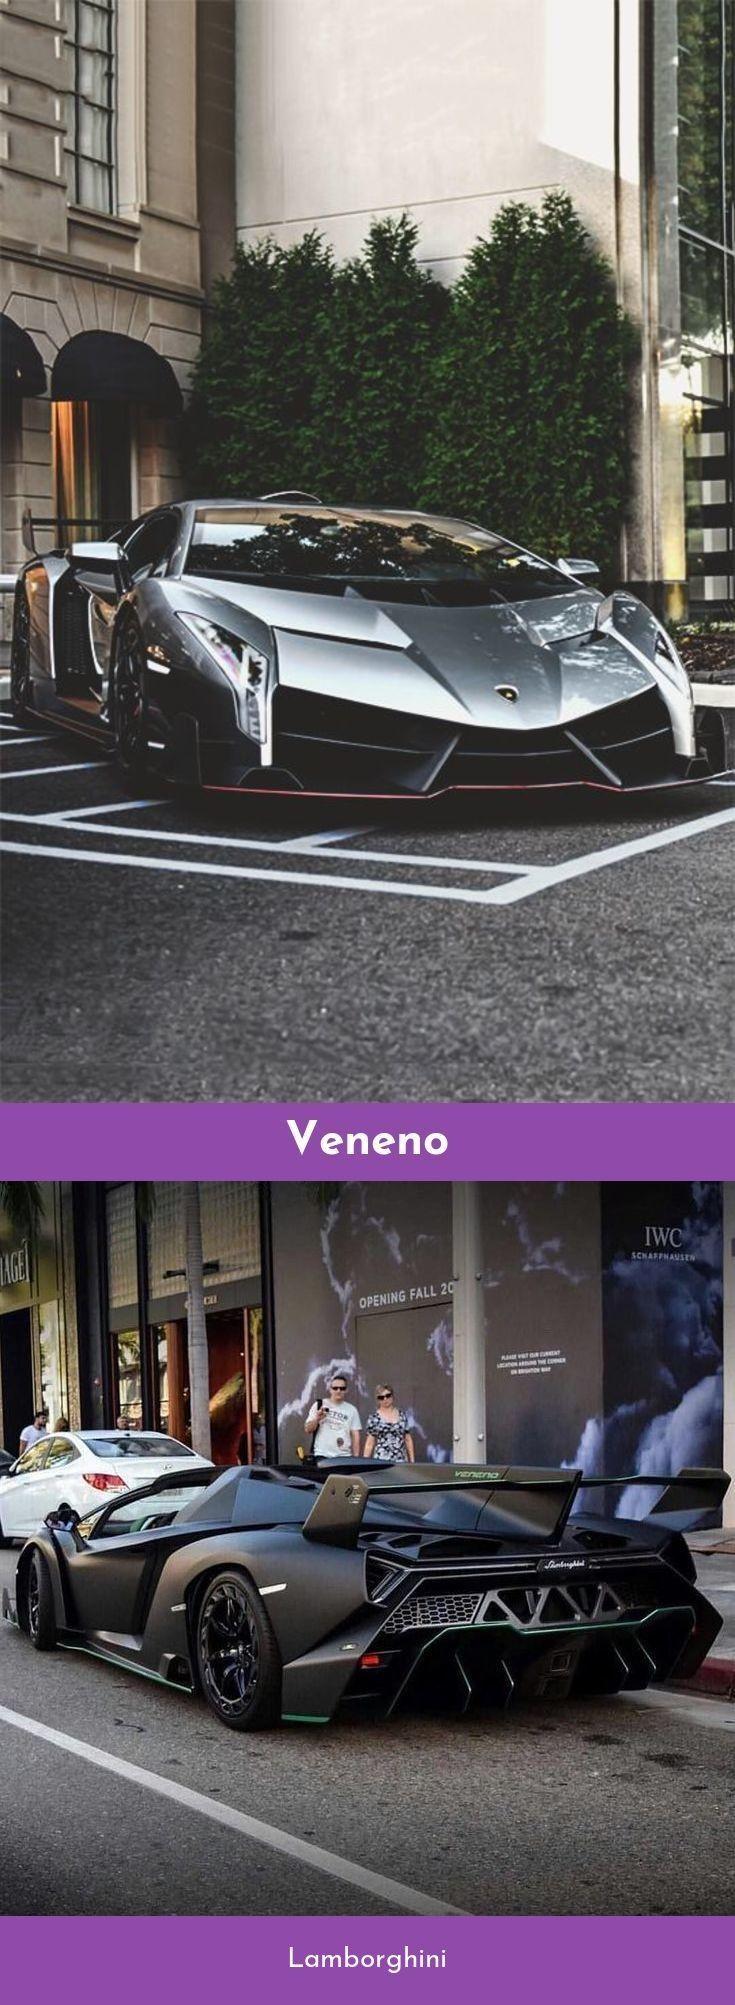 Veneno Lamborghiniveneno Carros De Luxo Carros Carros Esportivos